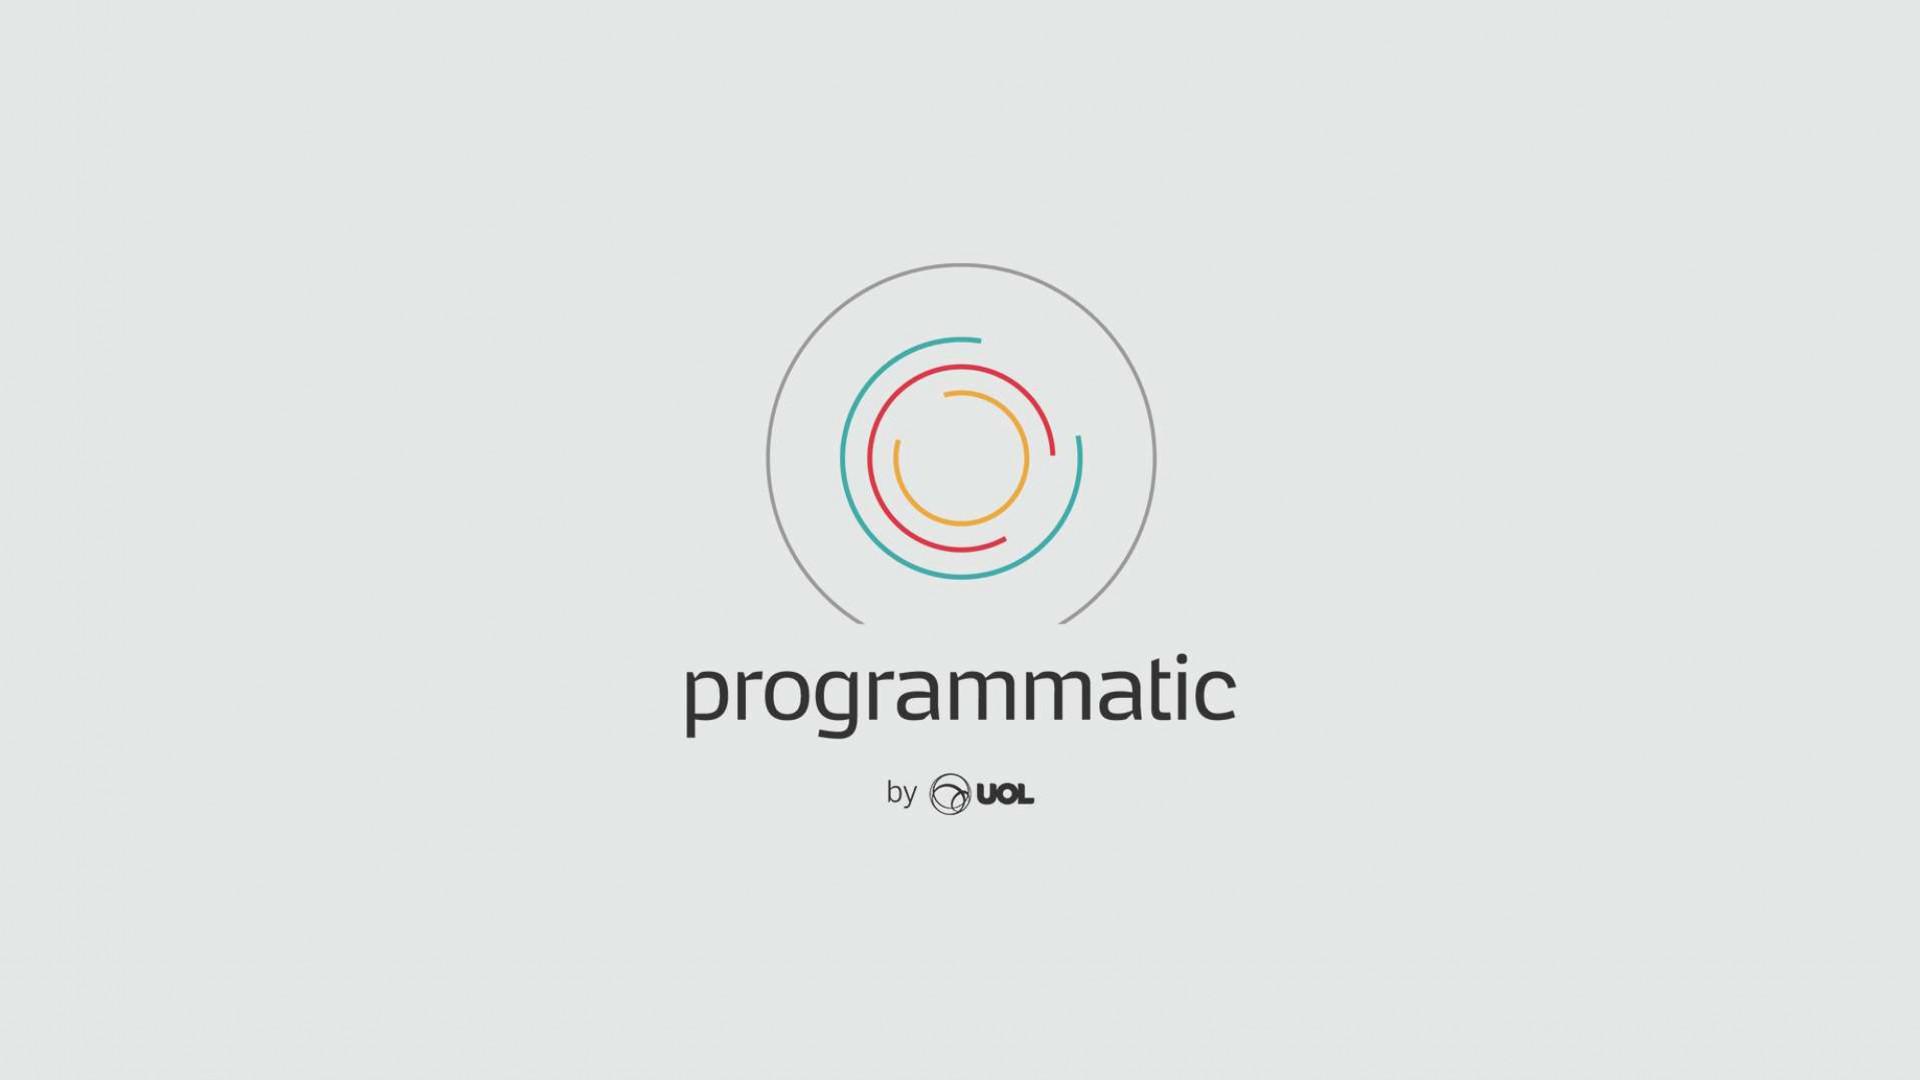 UOL_PROGRAMMATIC_202001_page-0001.jpg